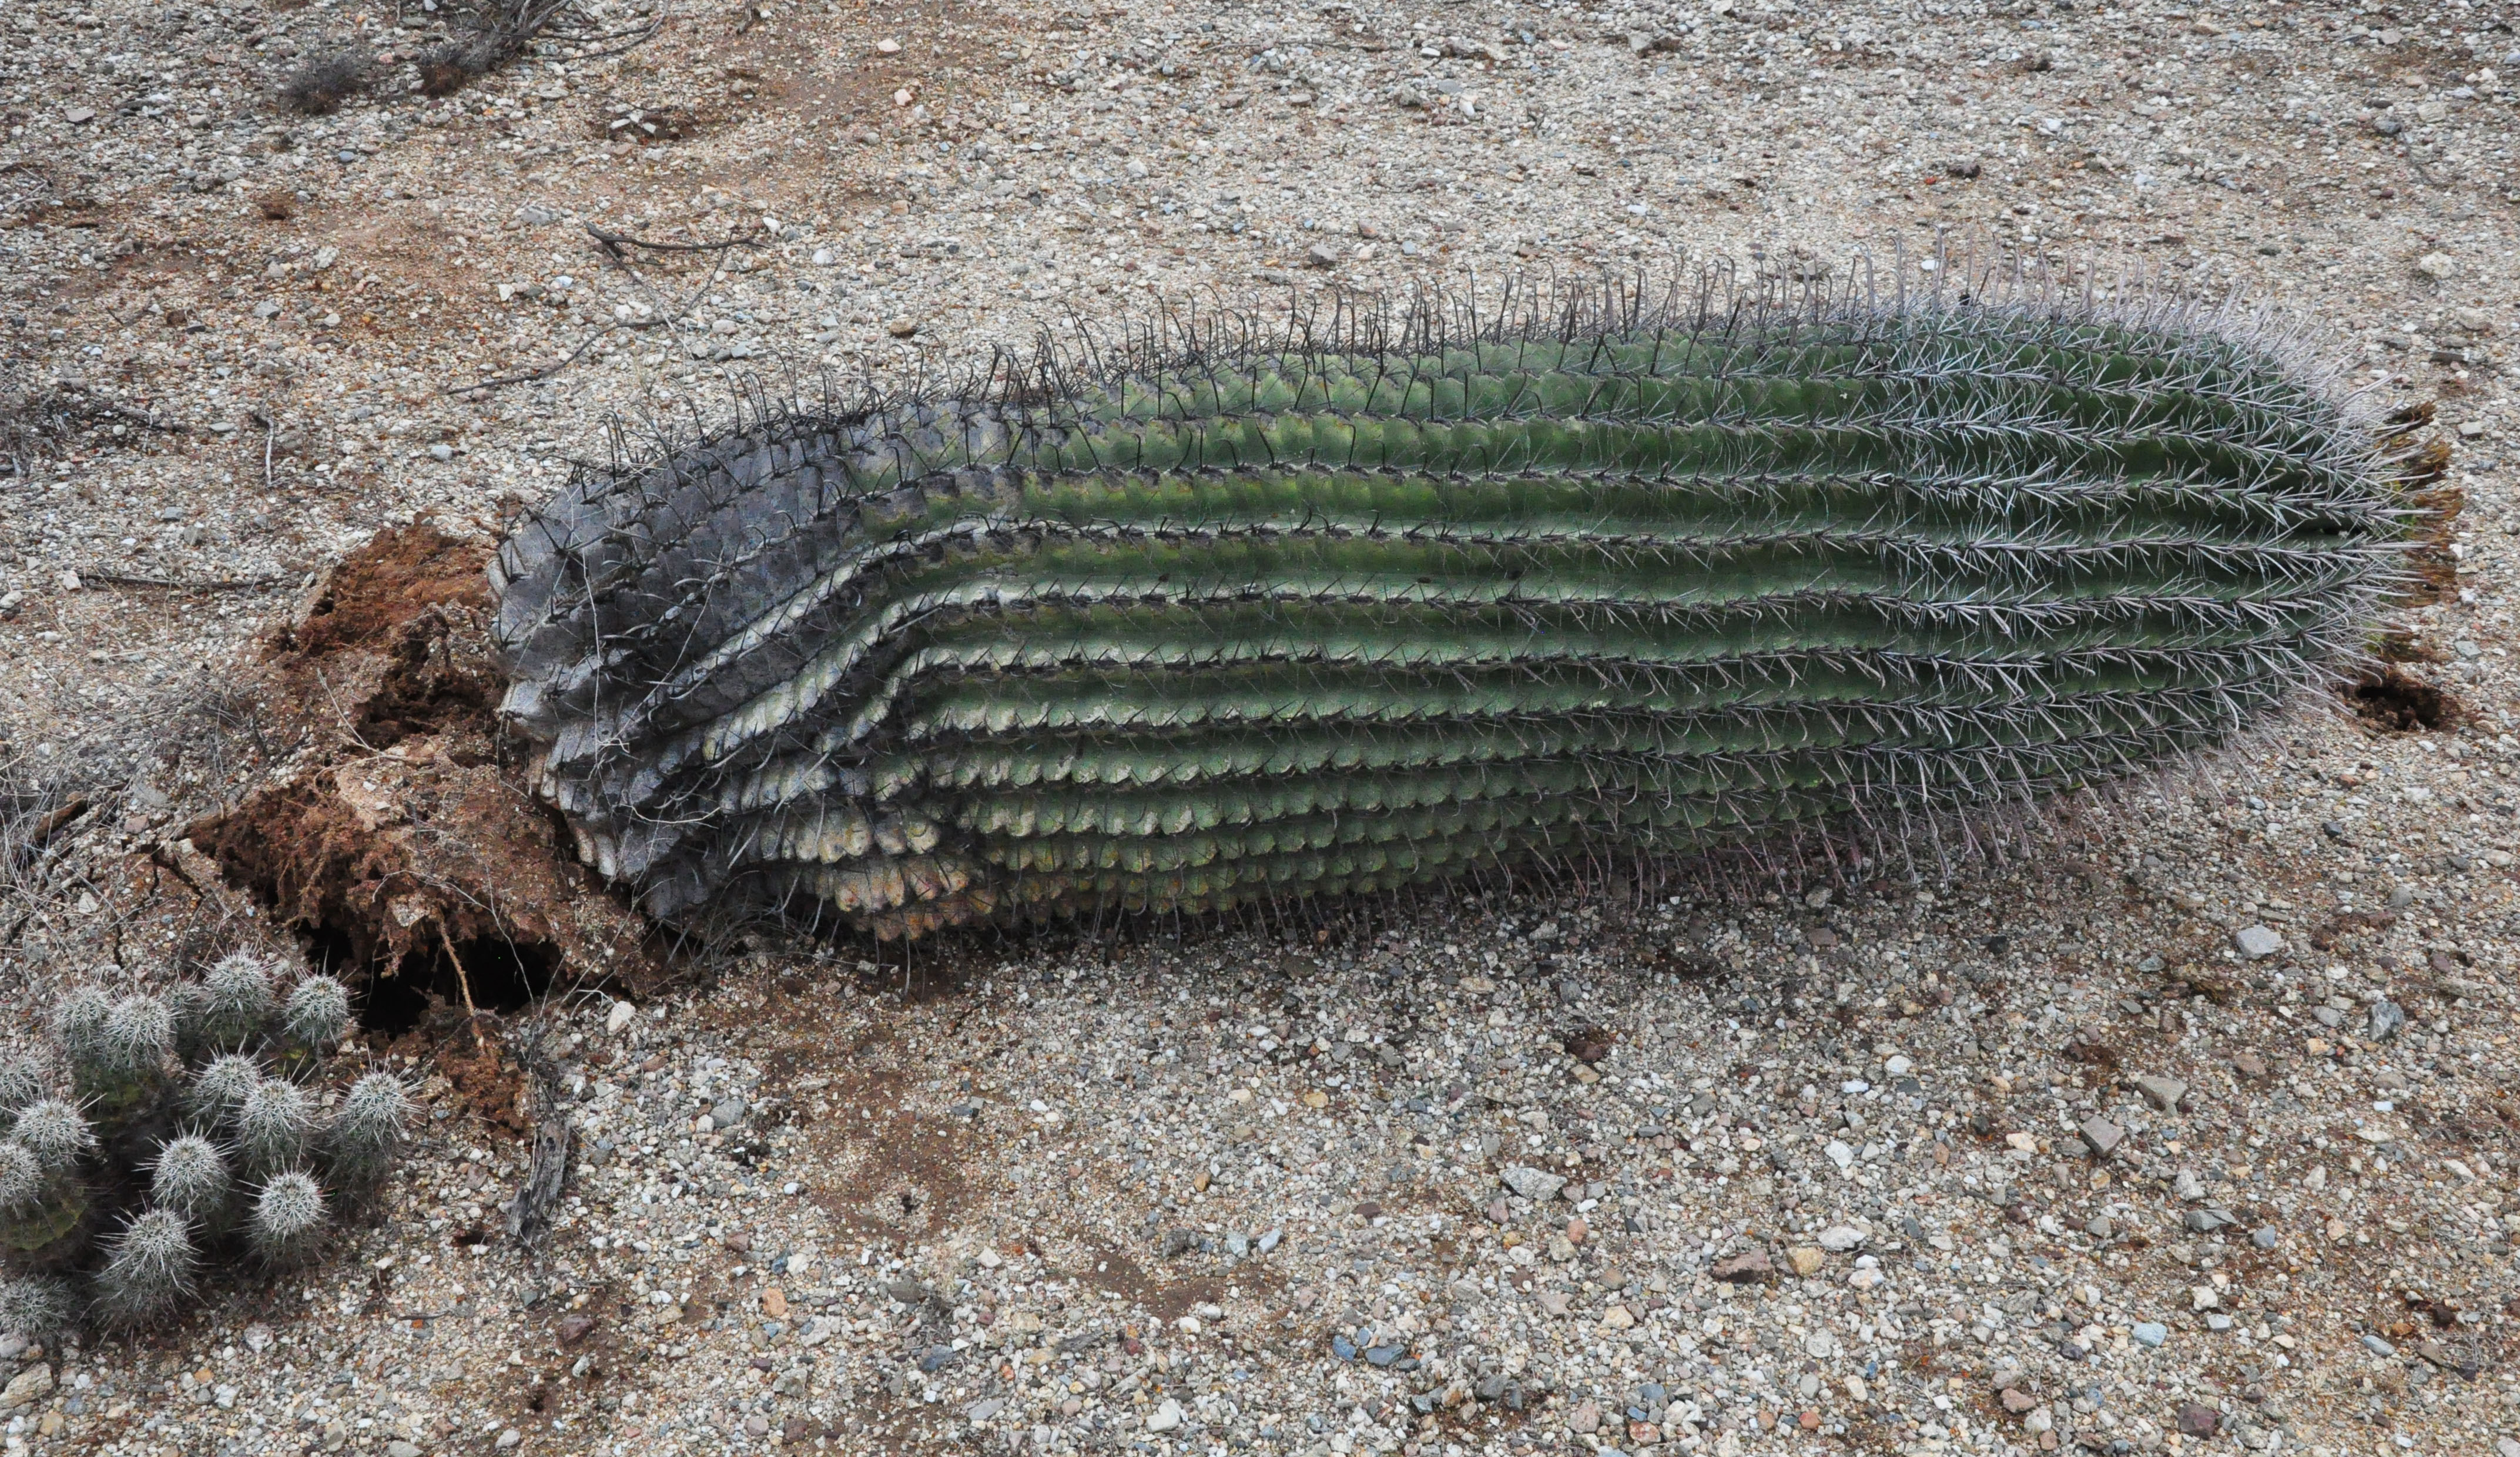 Leaning Barrel Cactus The Tallest Barrel Cactus